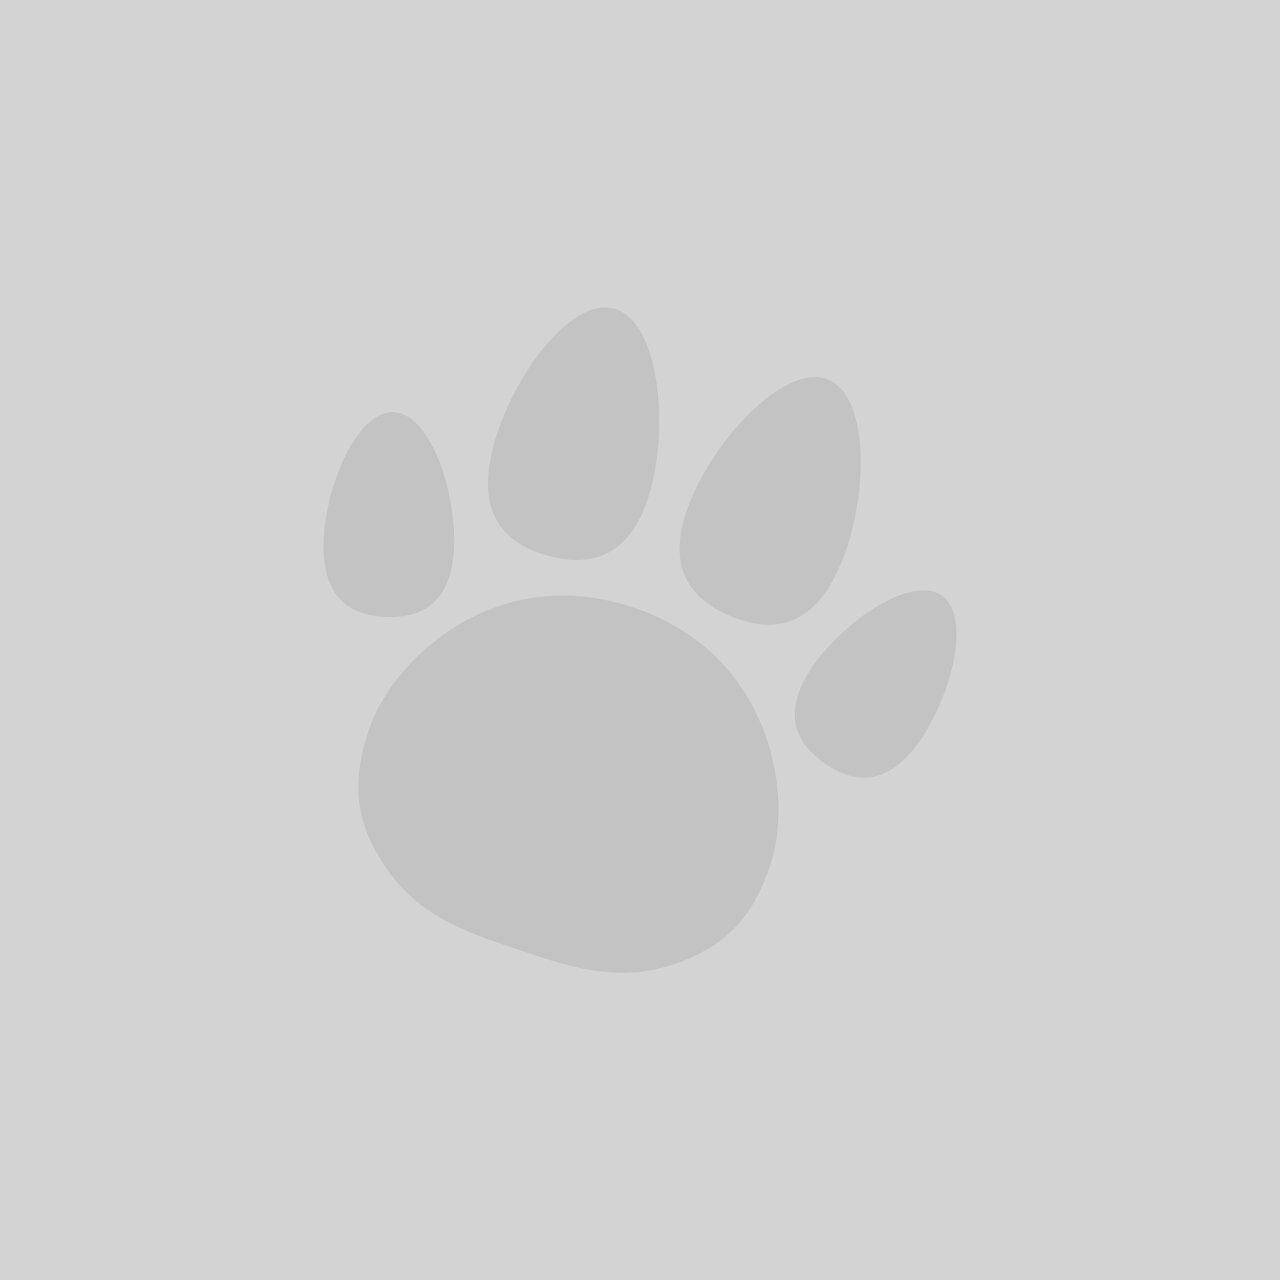 Hill's Science Plan Kitten Dry Food Chicken Flavour 1.5kg